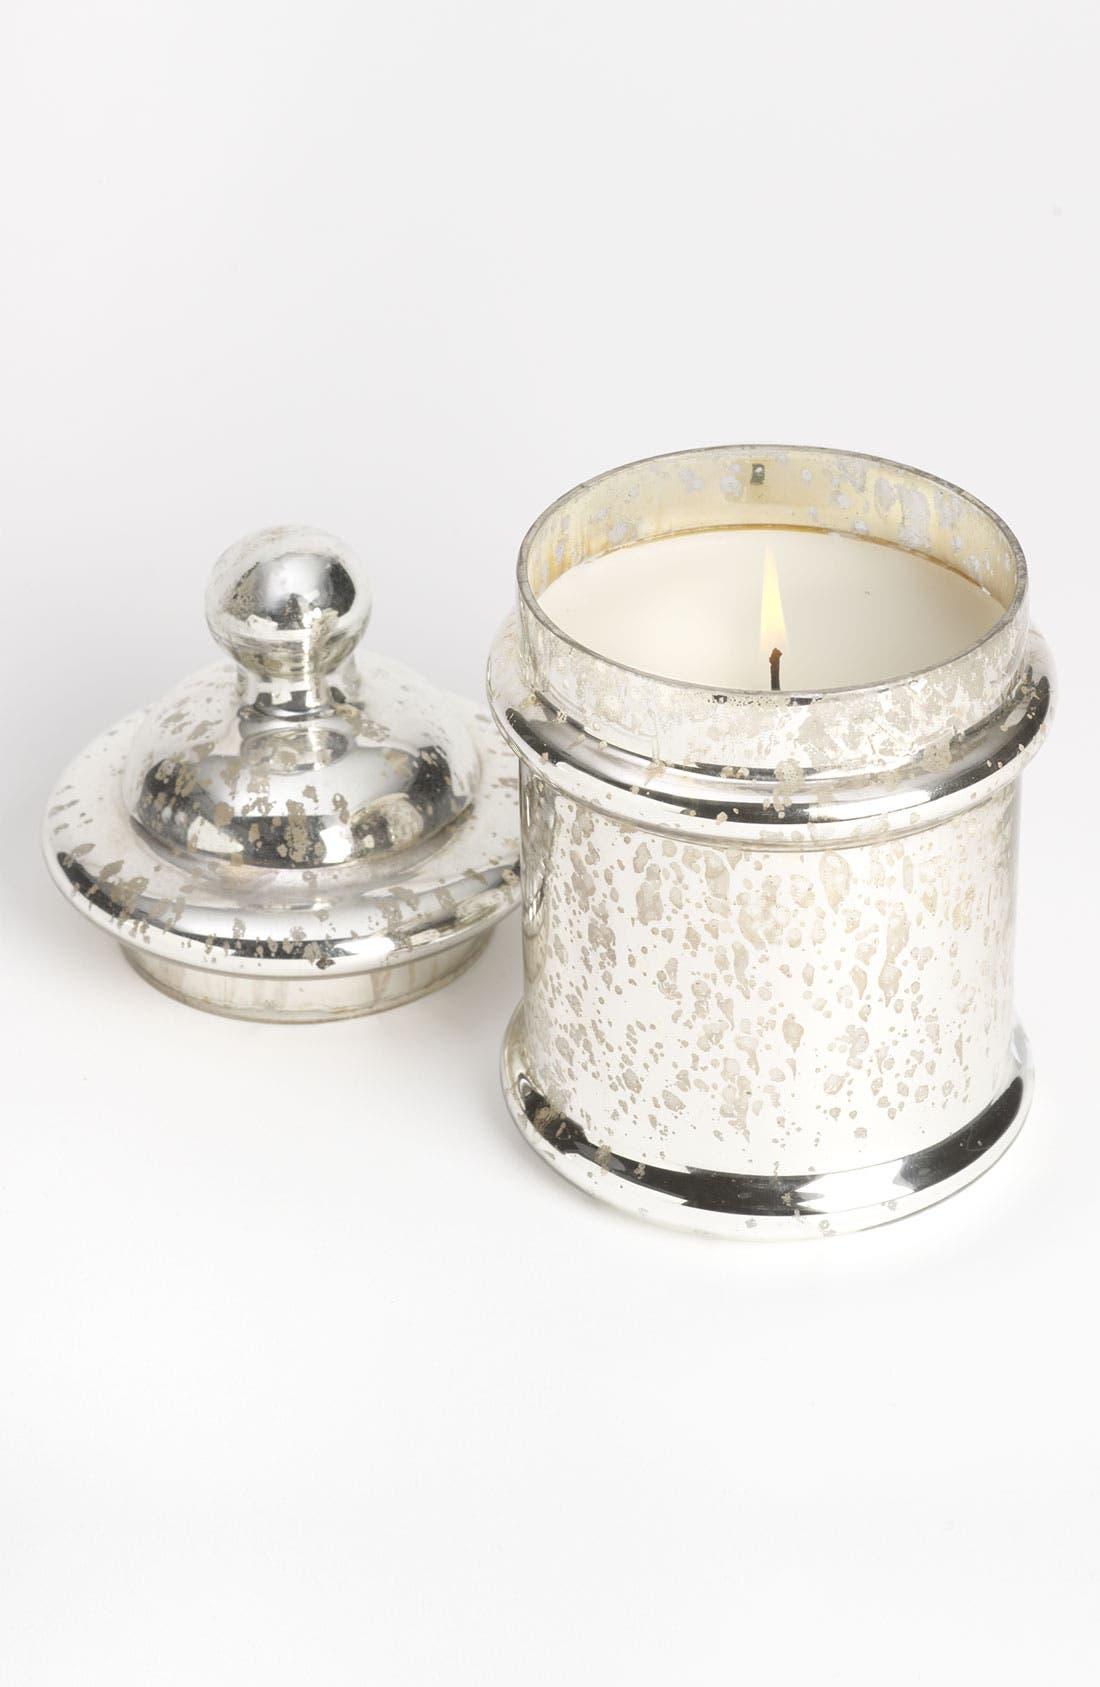 Main Image - Himalayan Trading Post Silver Candy Jar Candle